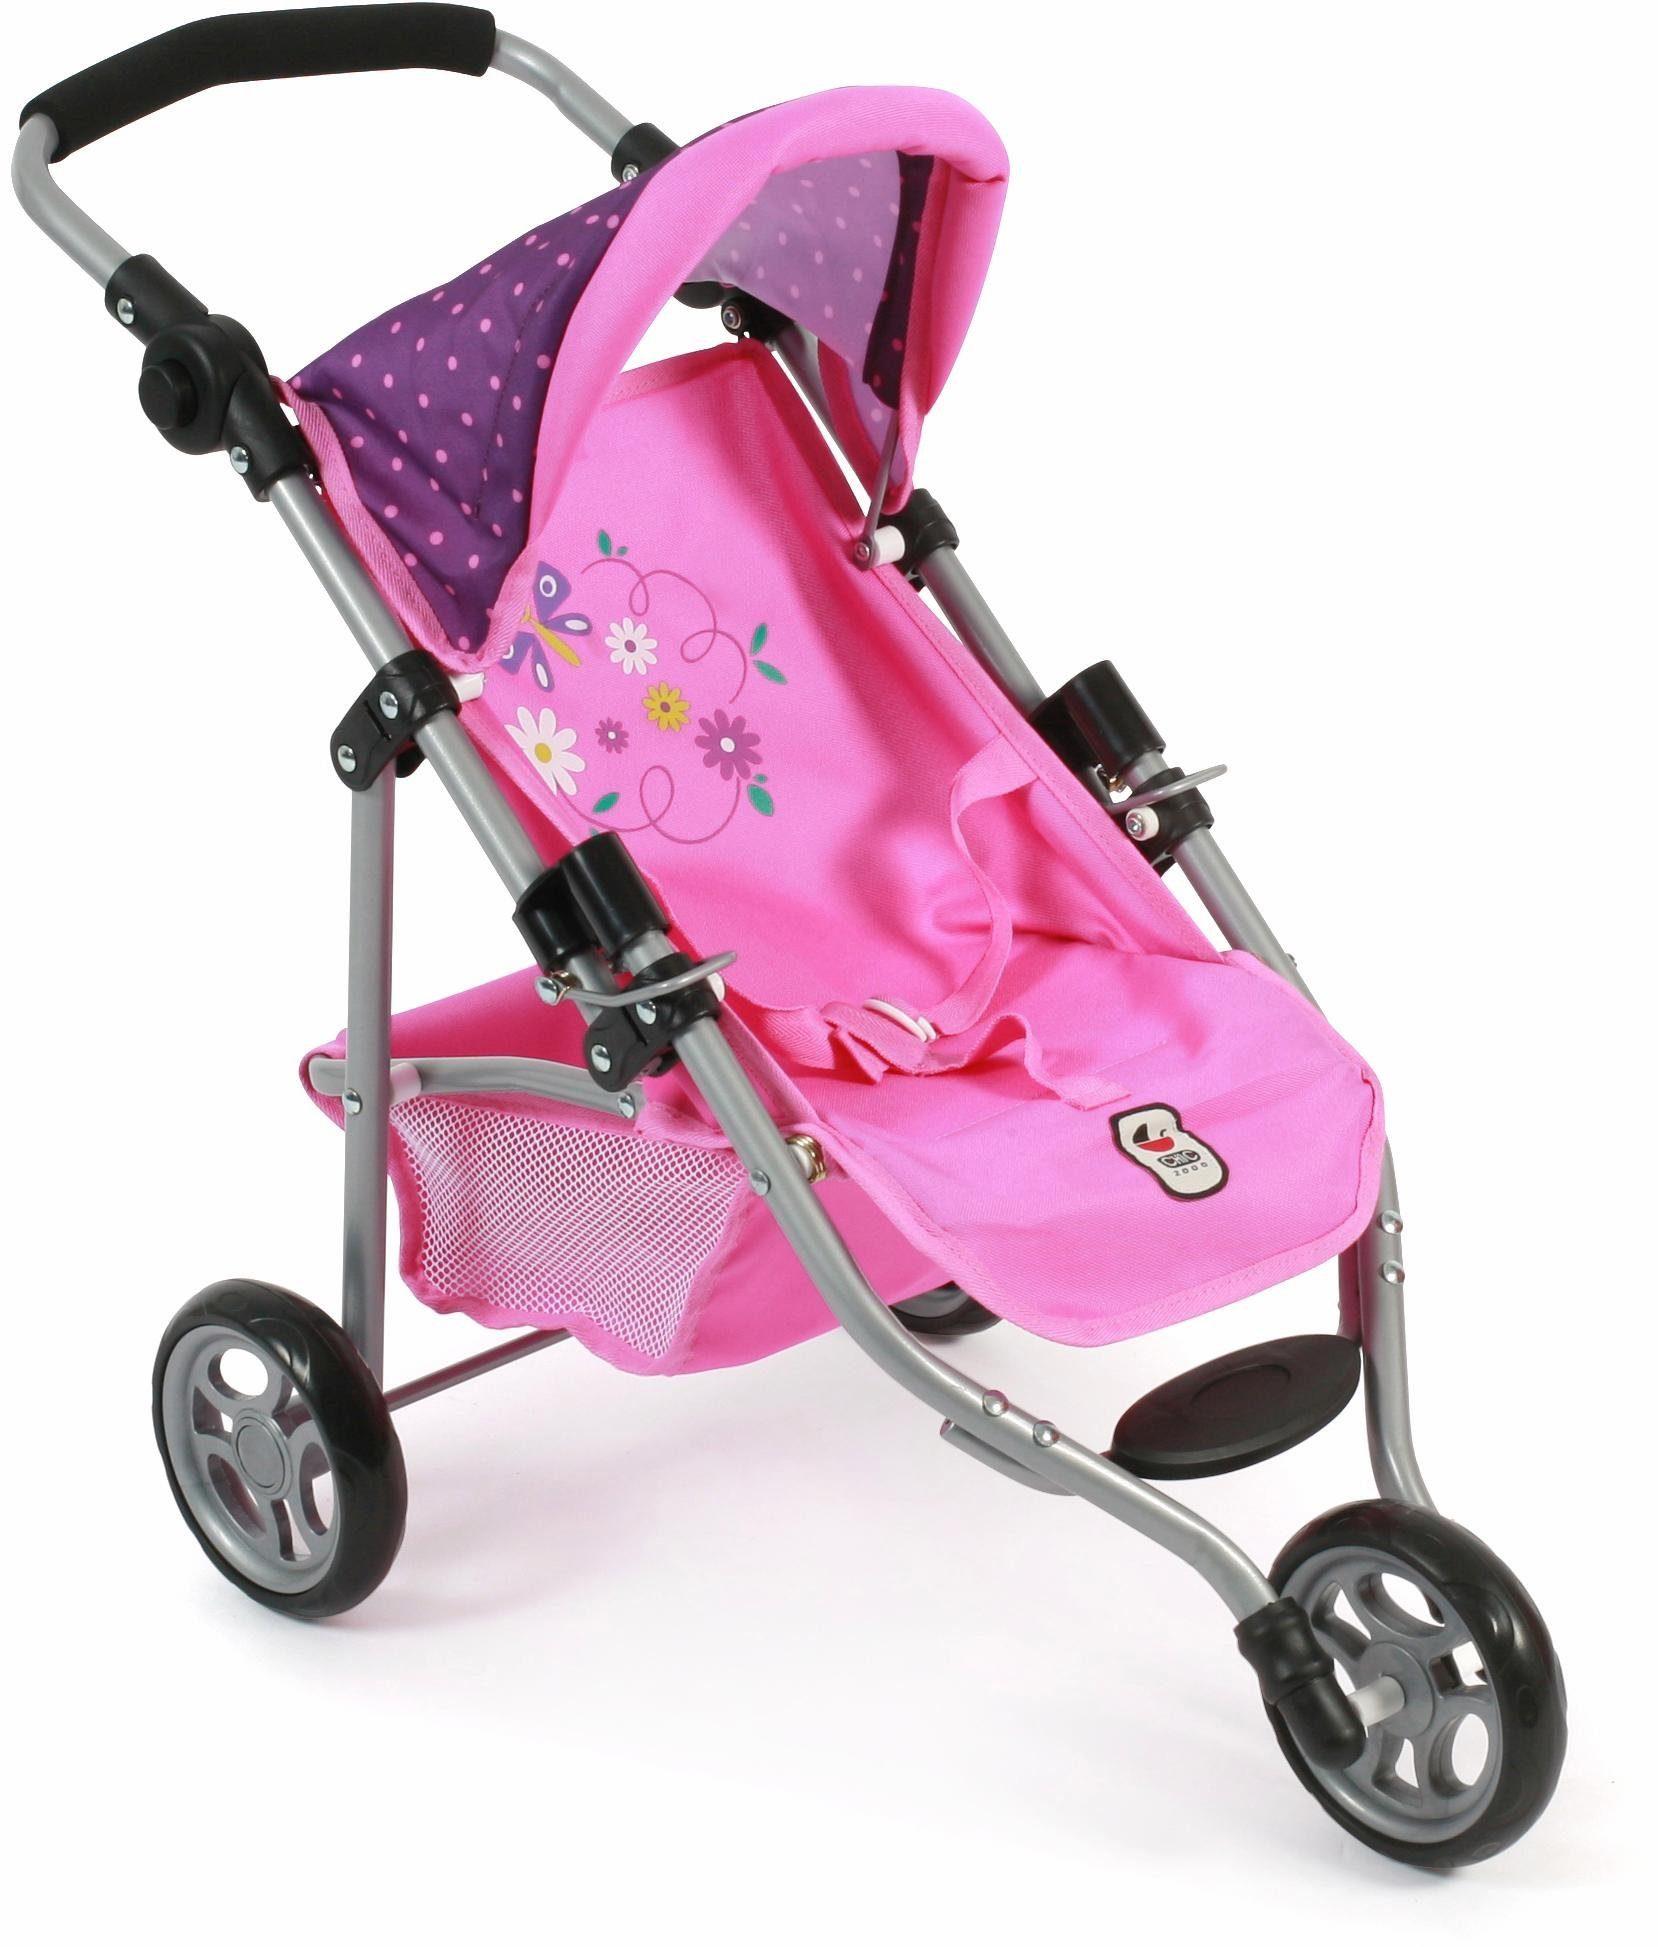 CHIC2000 Puppen Jogging Buggy mit Gurt, »Lola, lila-pink«